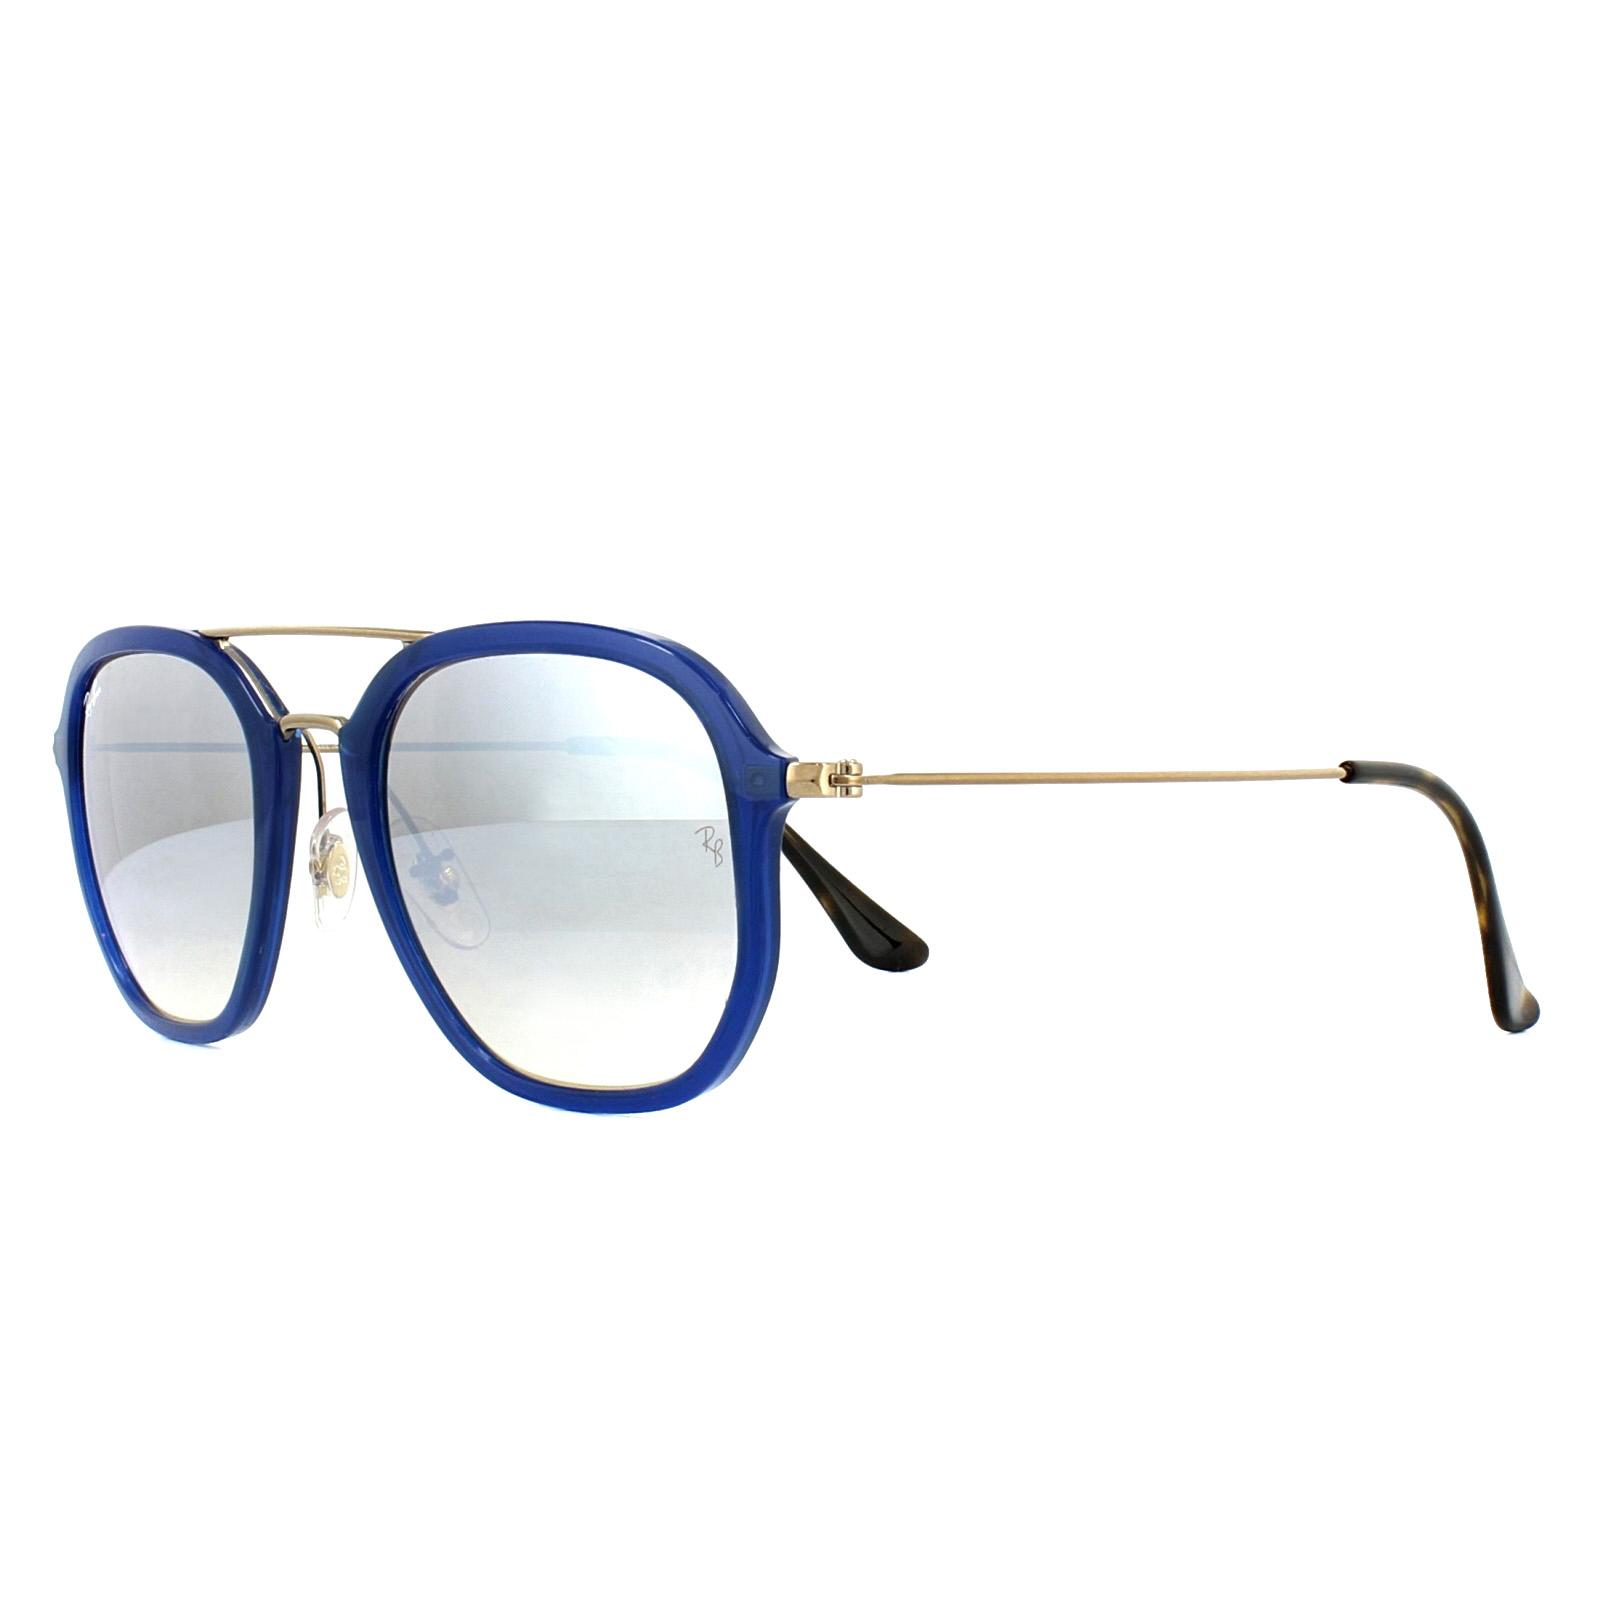 9f1d780a65 Cheap Ray-Ban 4273 Sunglasses - Discounted Sunglasses